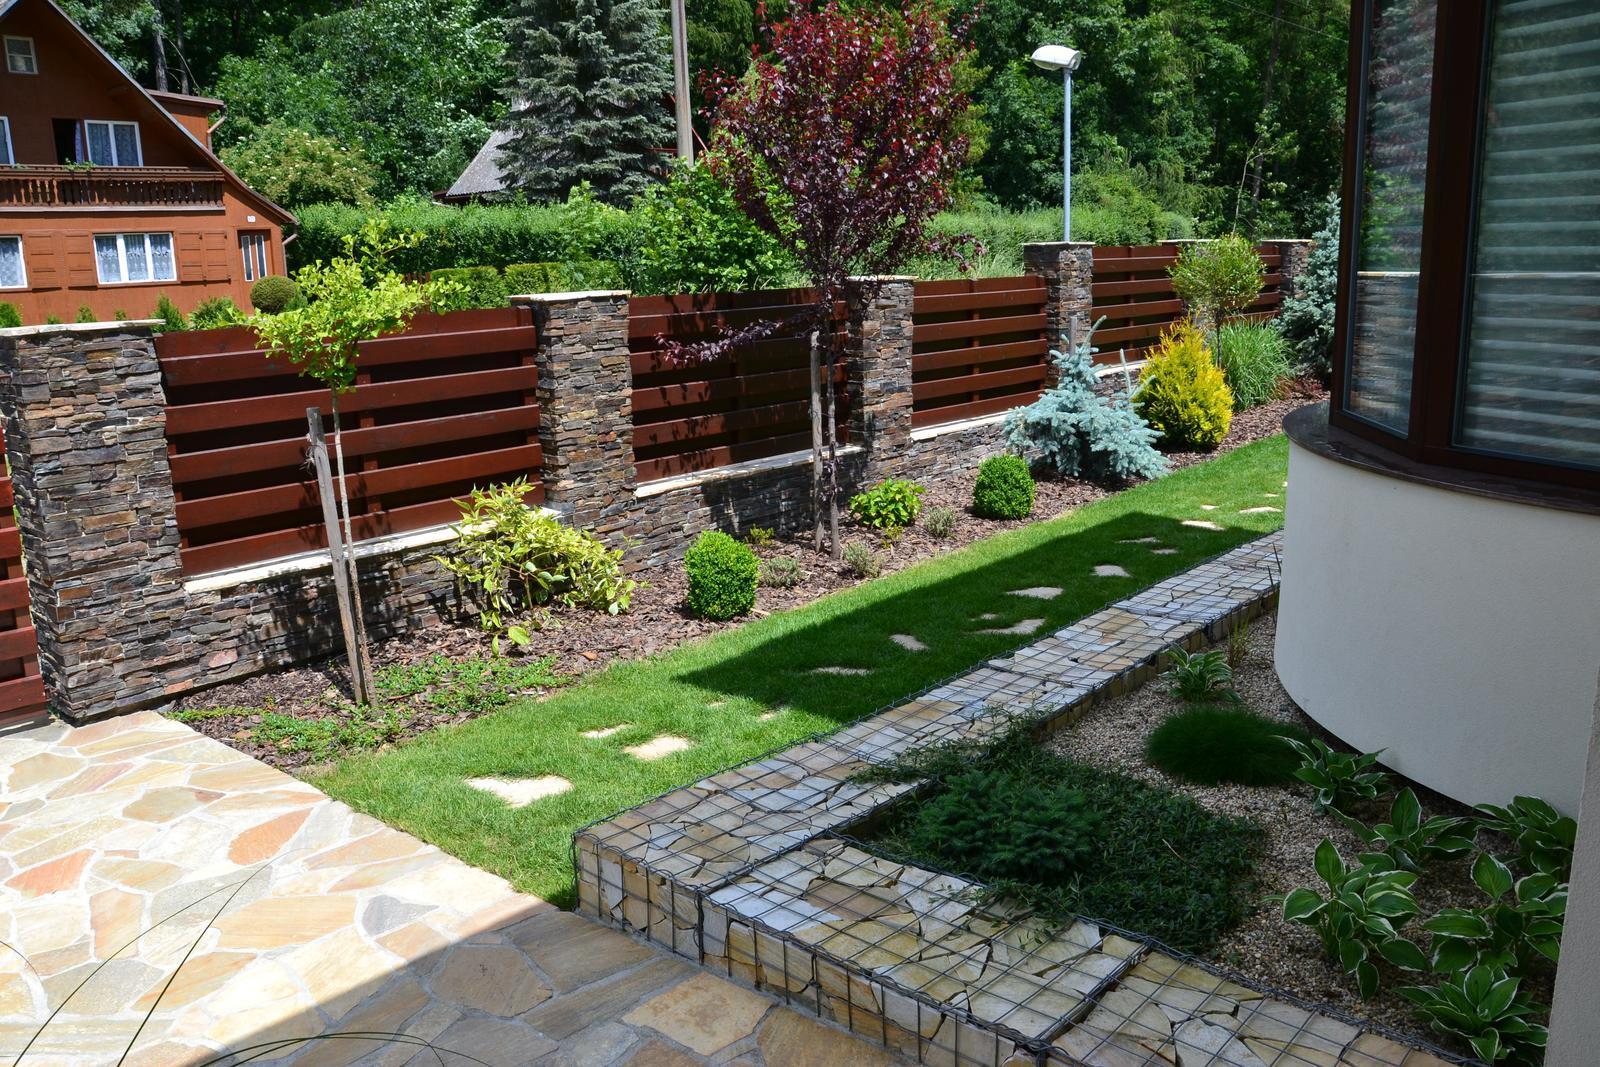 Zahrada - Obrázek č. 91